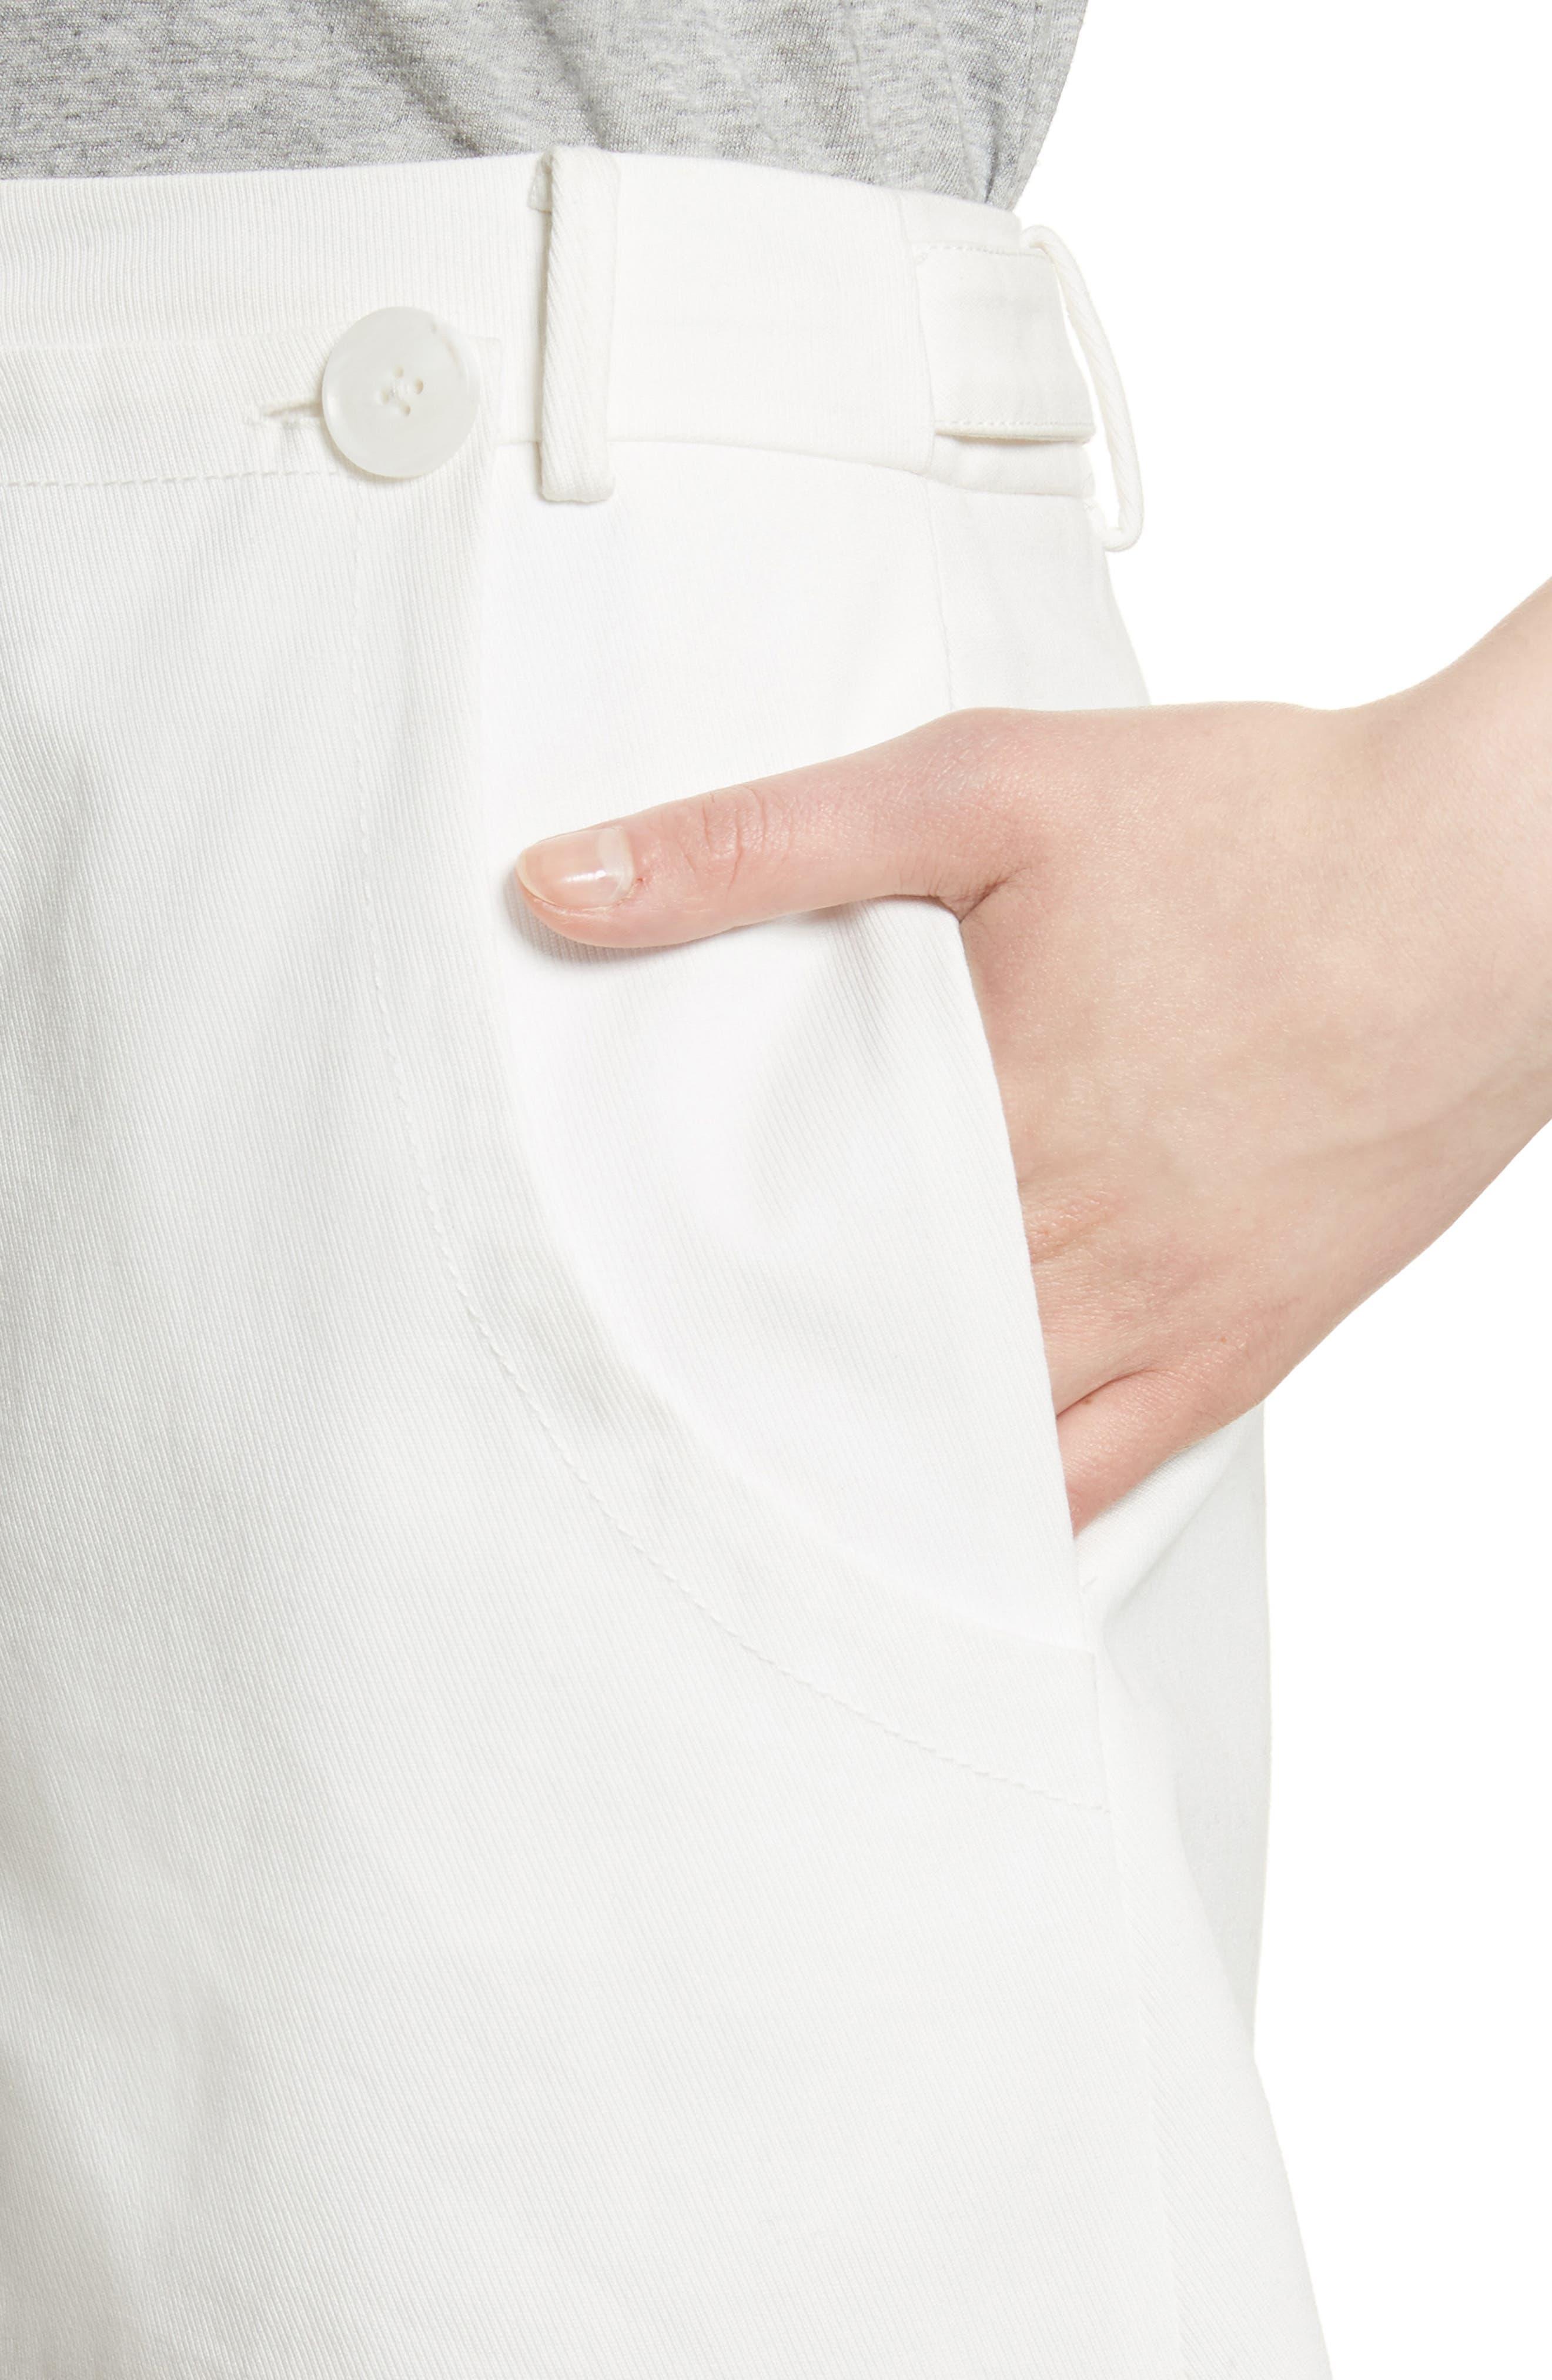 GREY Jason Wu Stretch Cotton Sailor Shorts,                             Alternate thumbnail 4, color,                             110